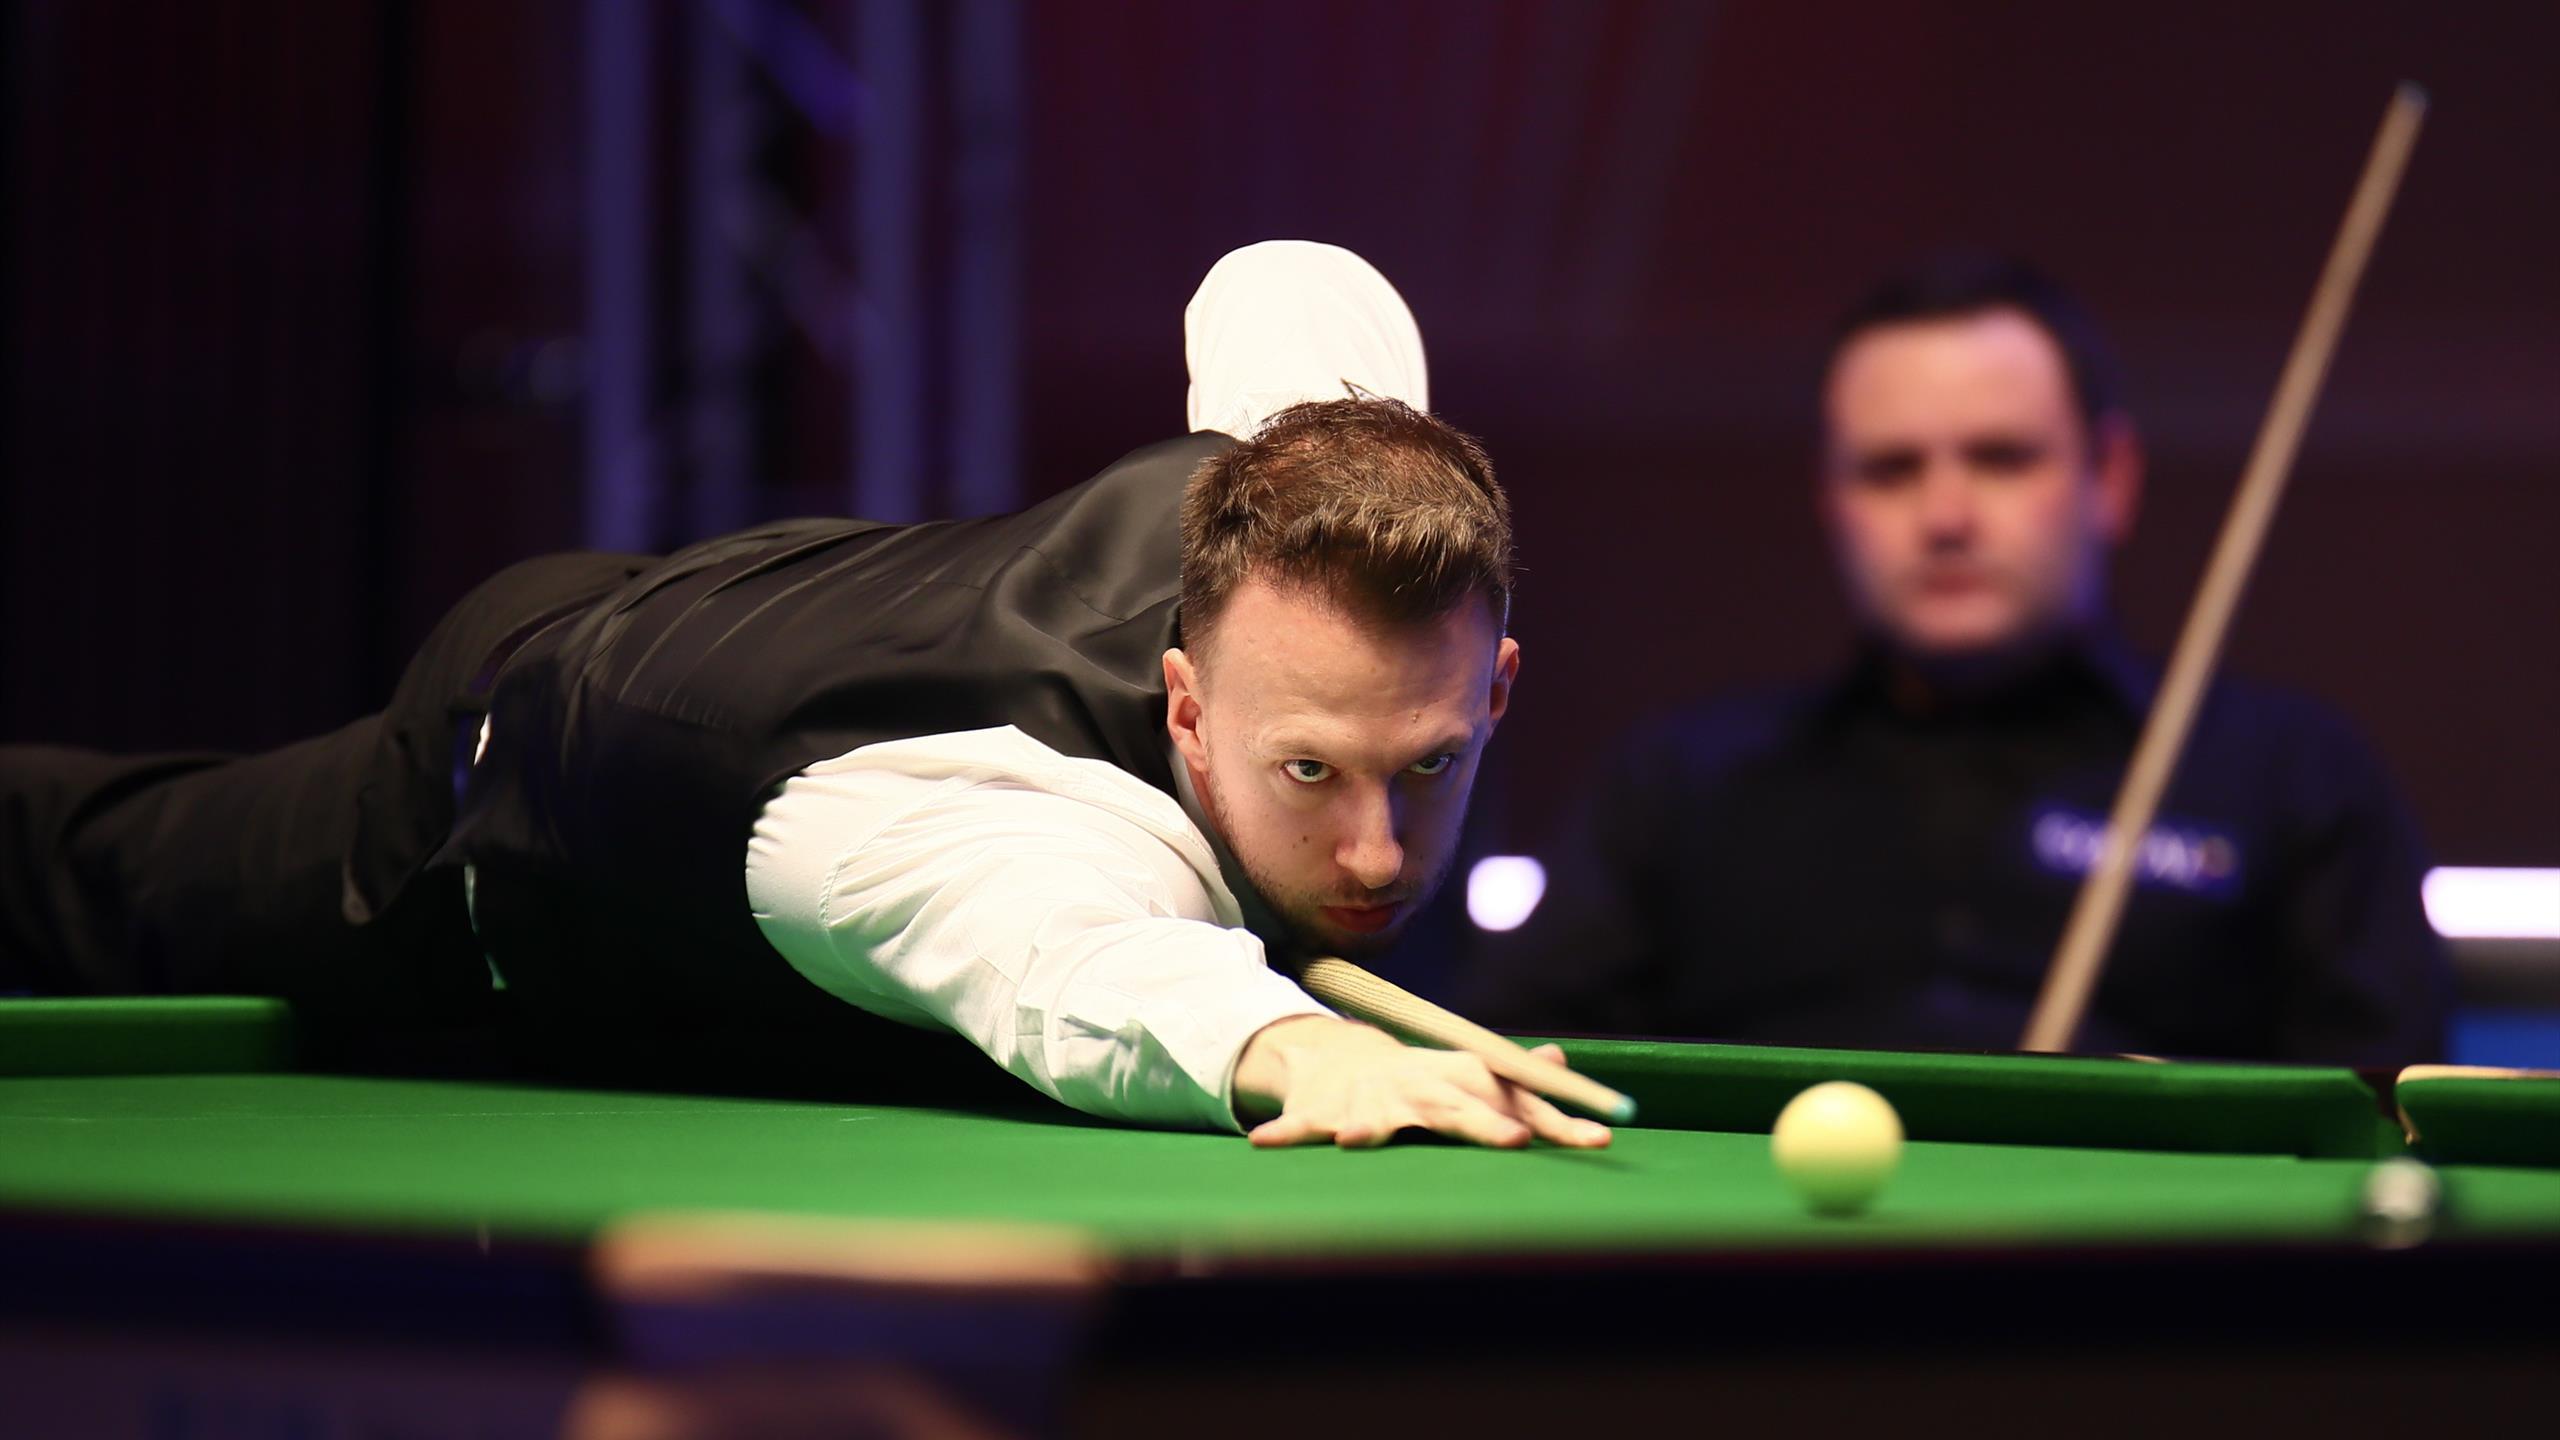 Weltrangliste Snooker 2021